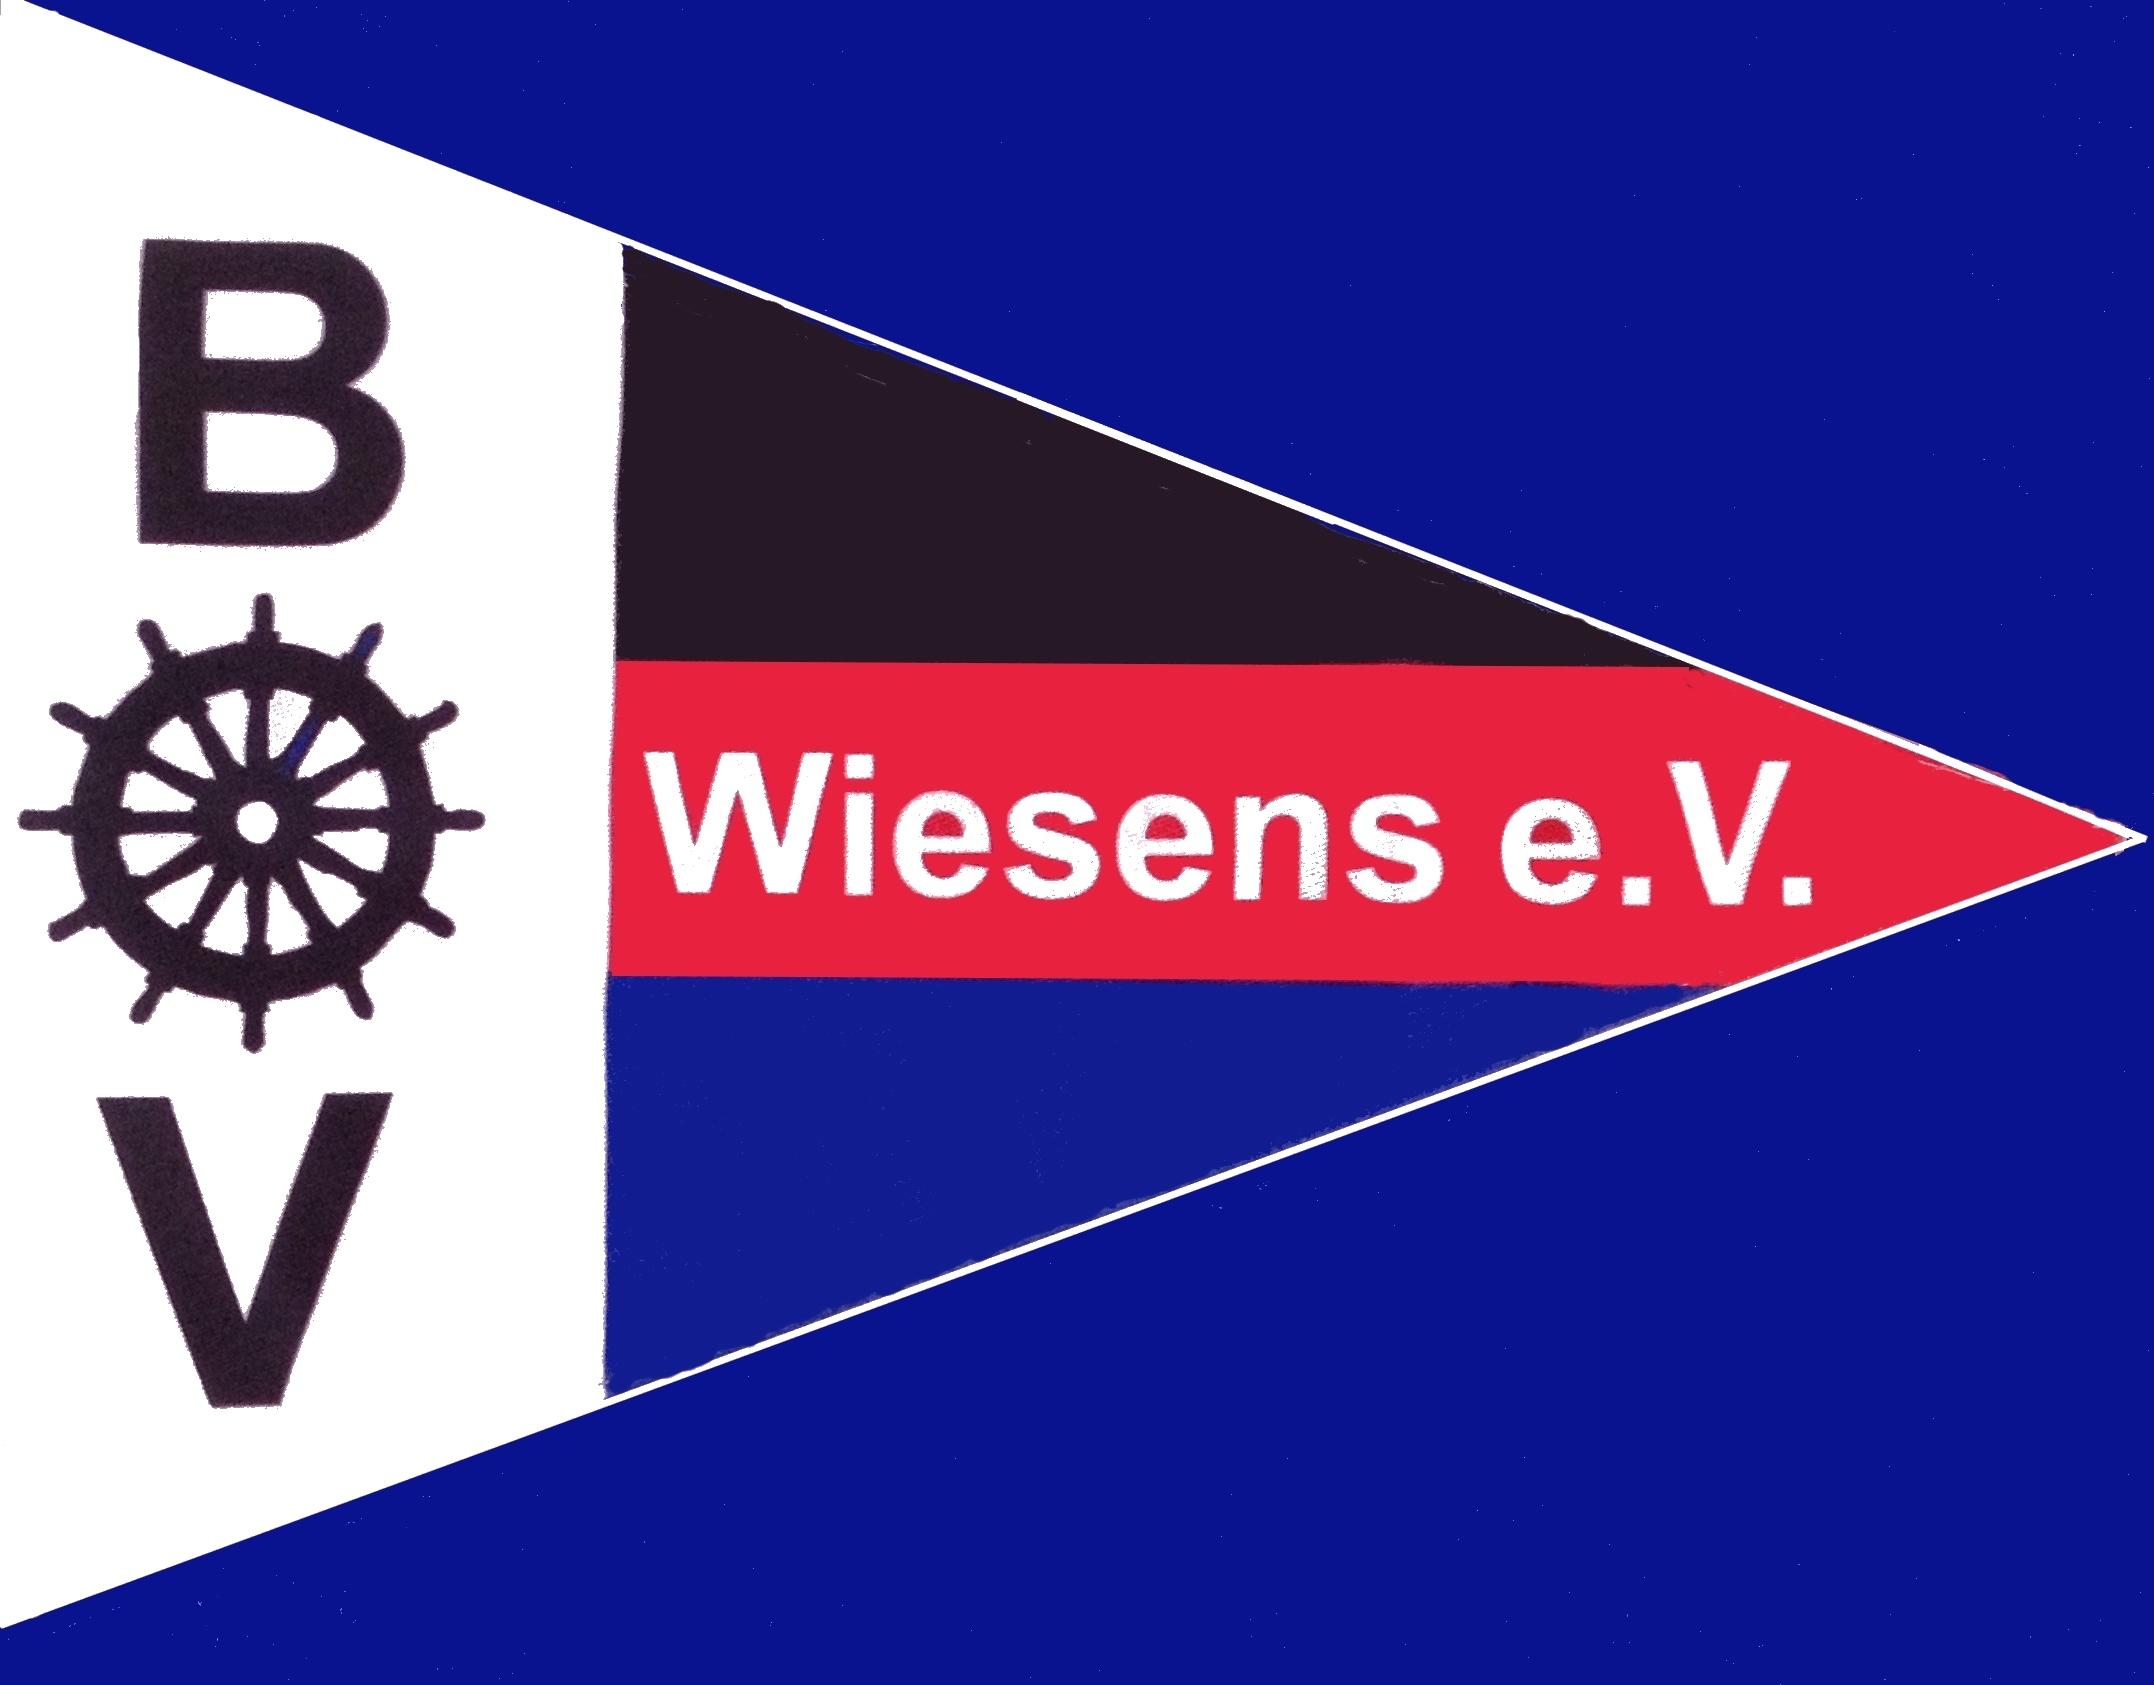 Bootsportverein-Wiesens.de